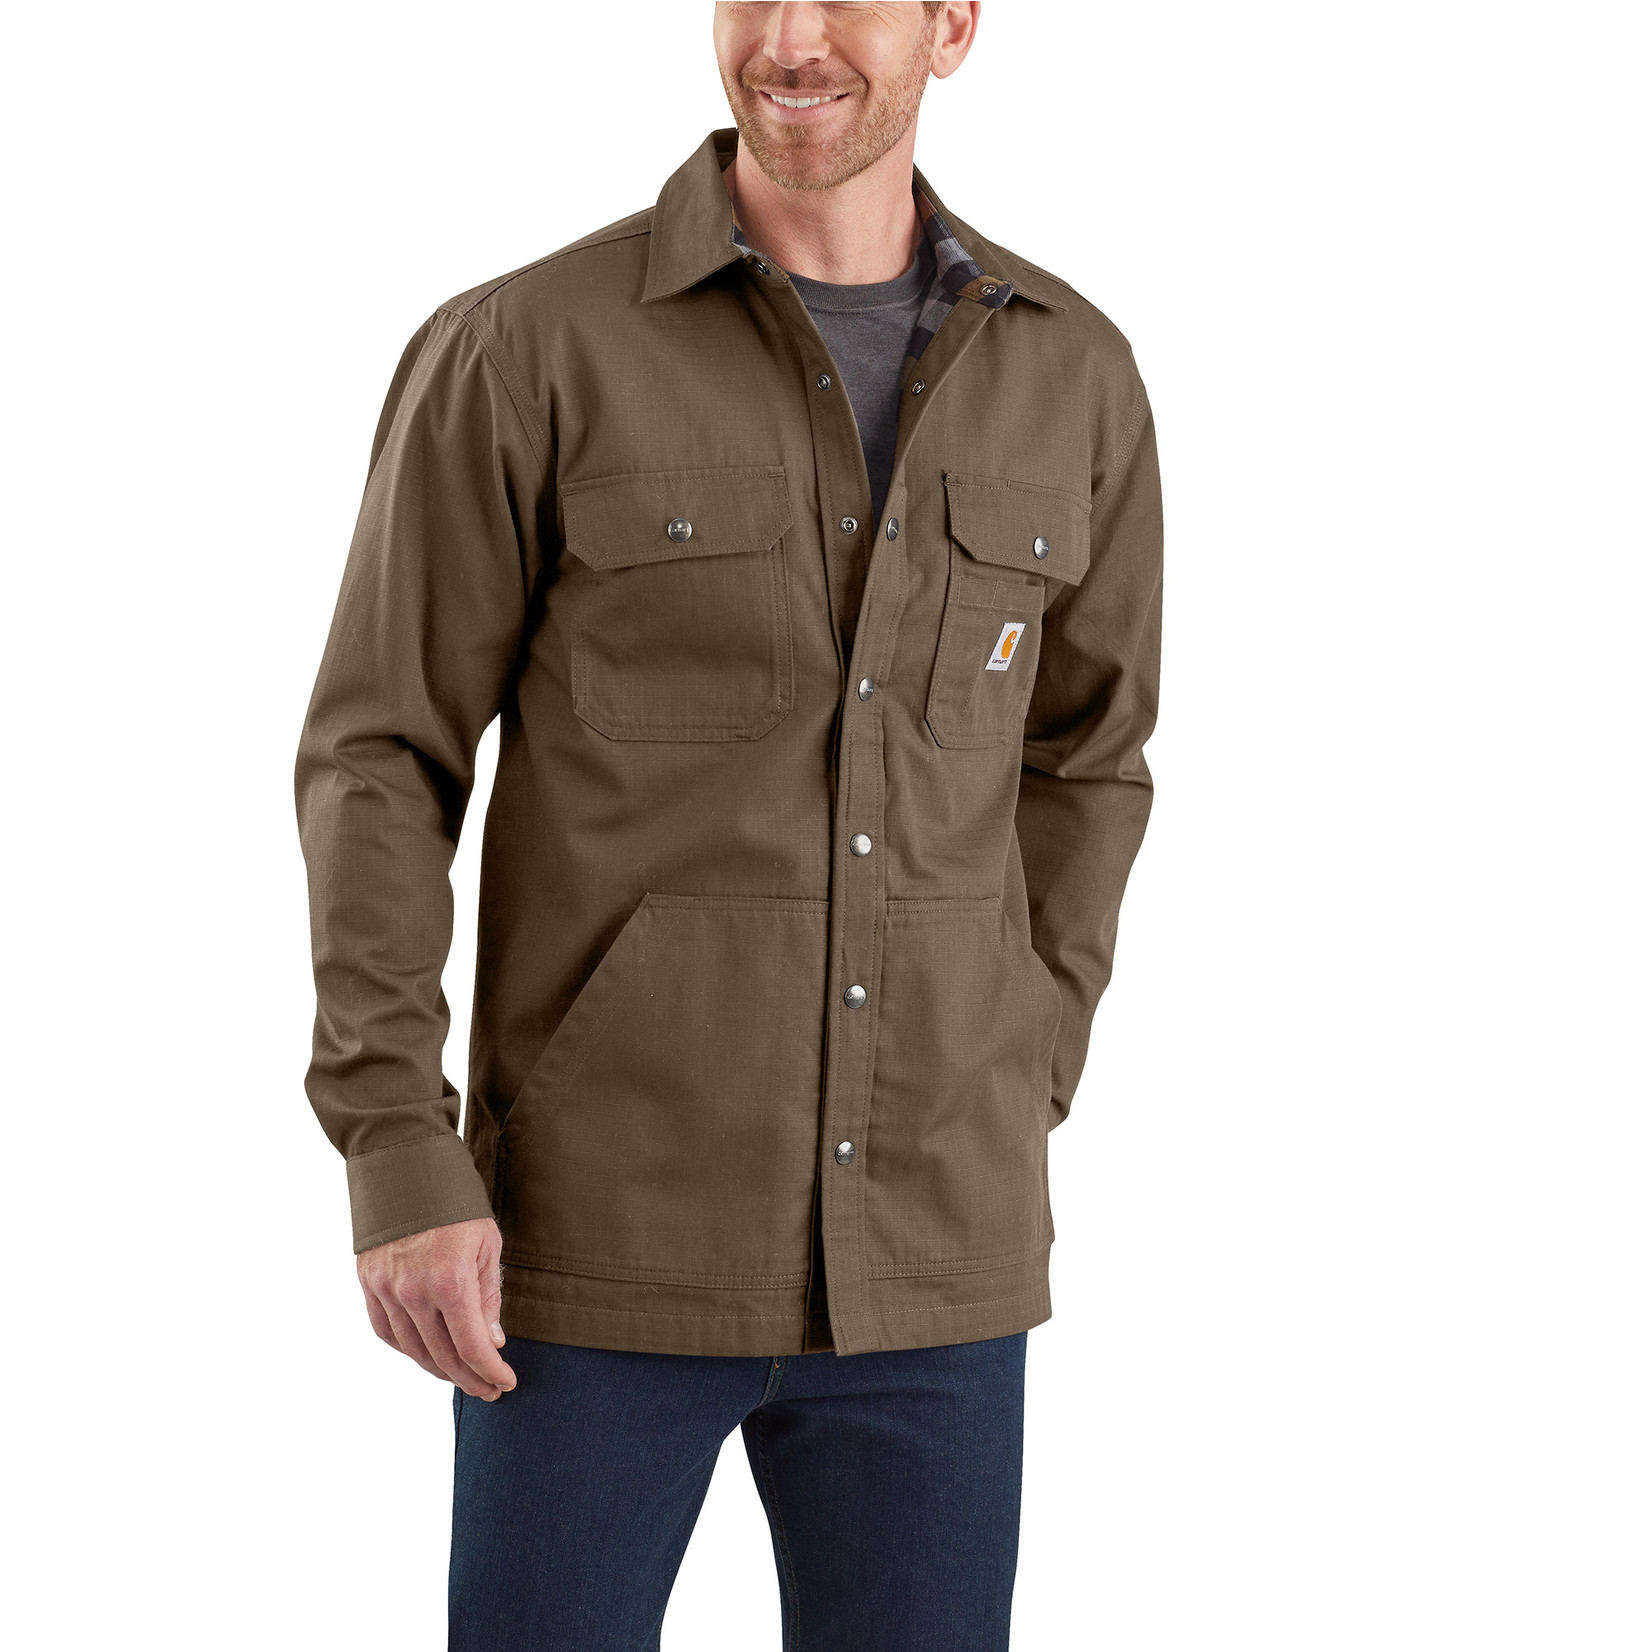 Carhartt Carhartt 104146 Loose Fit Ripstop Snap Shirt Jacket